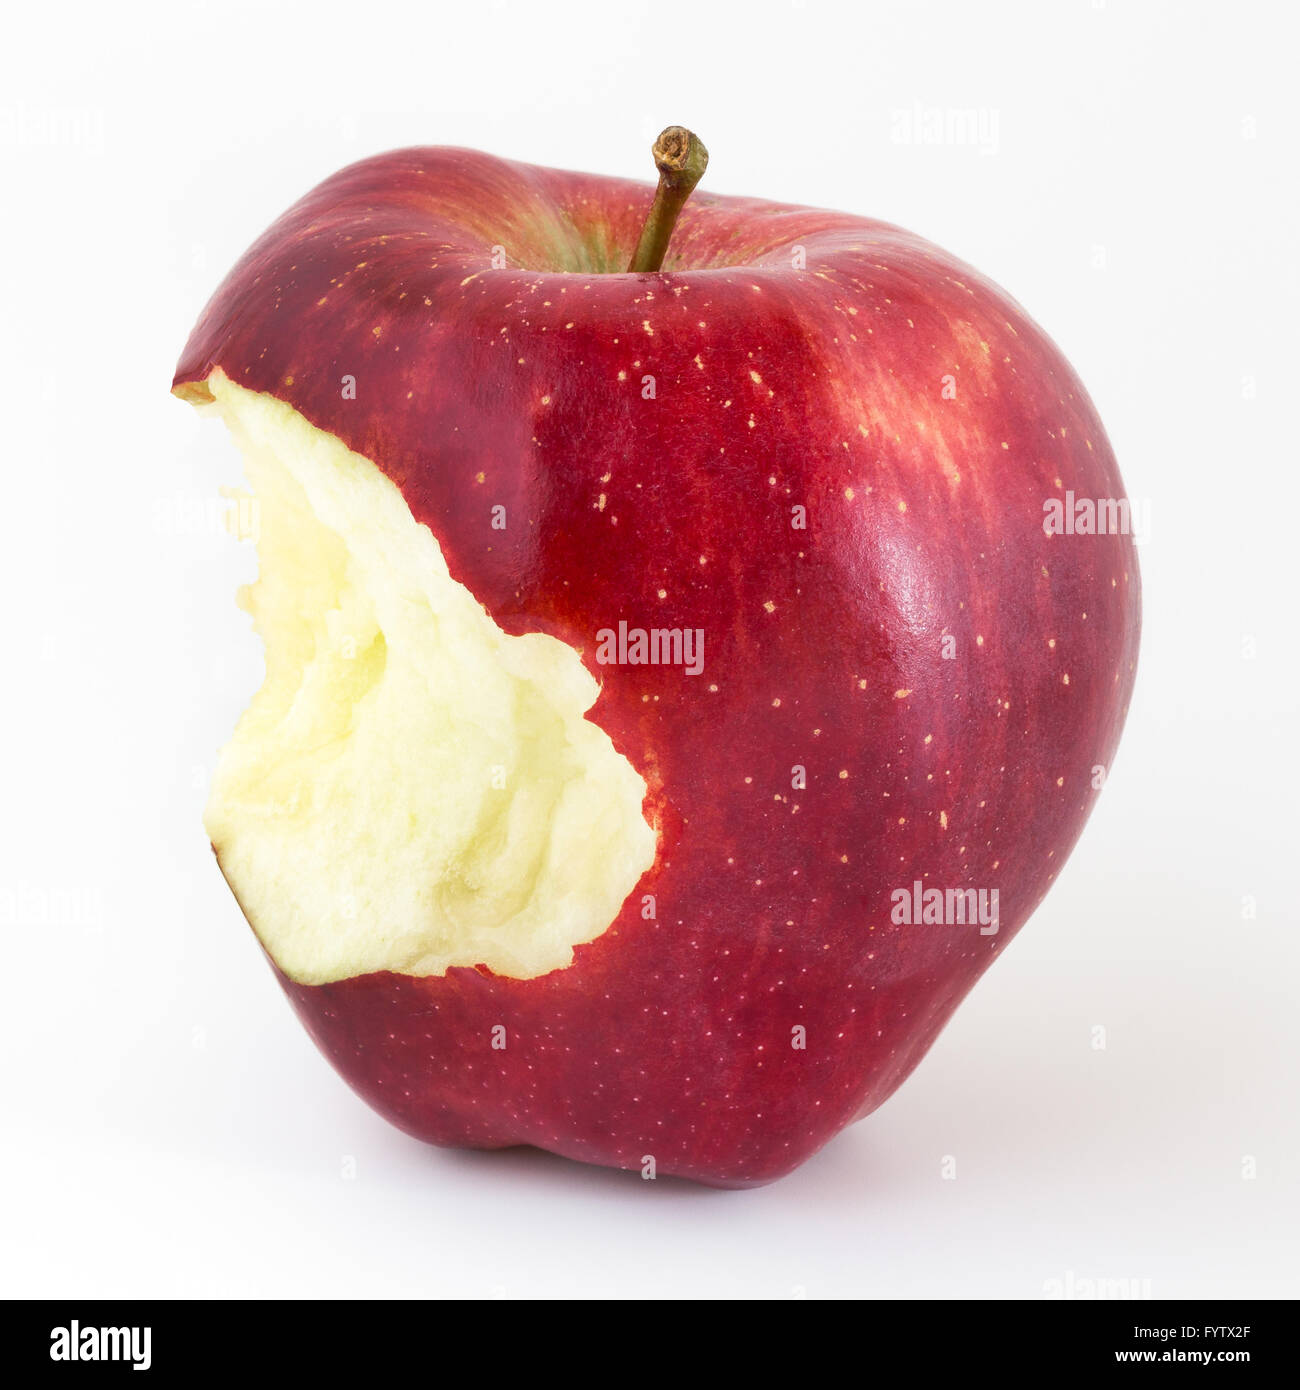 Bitten apple - Stock Image